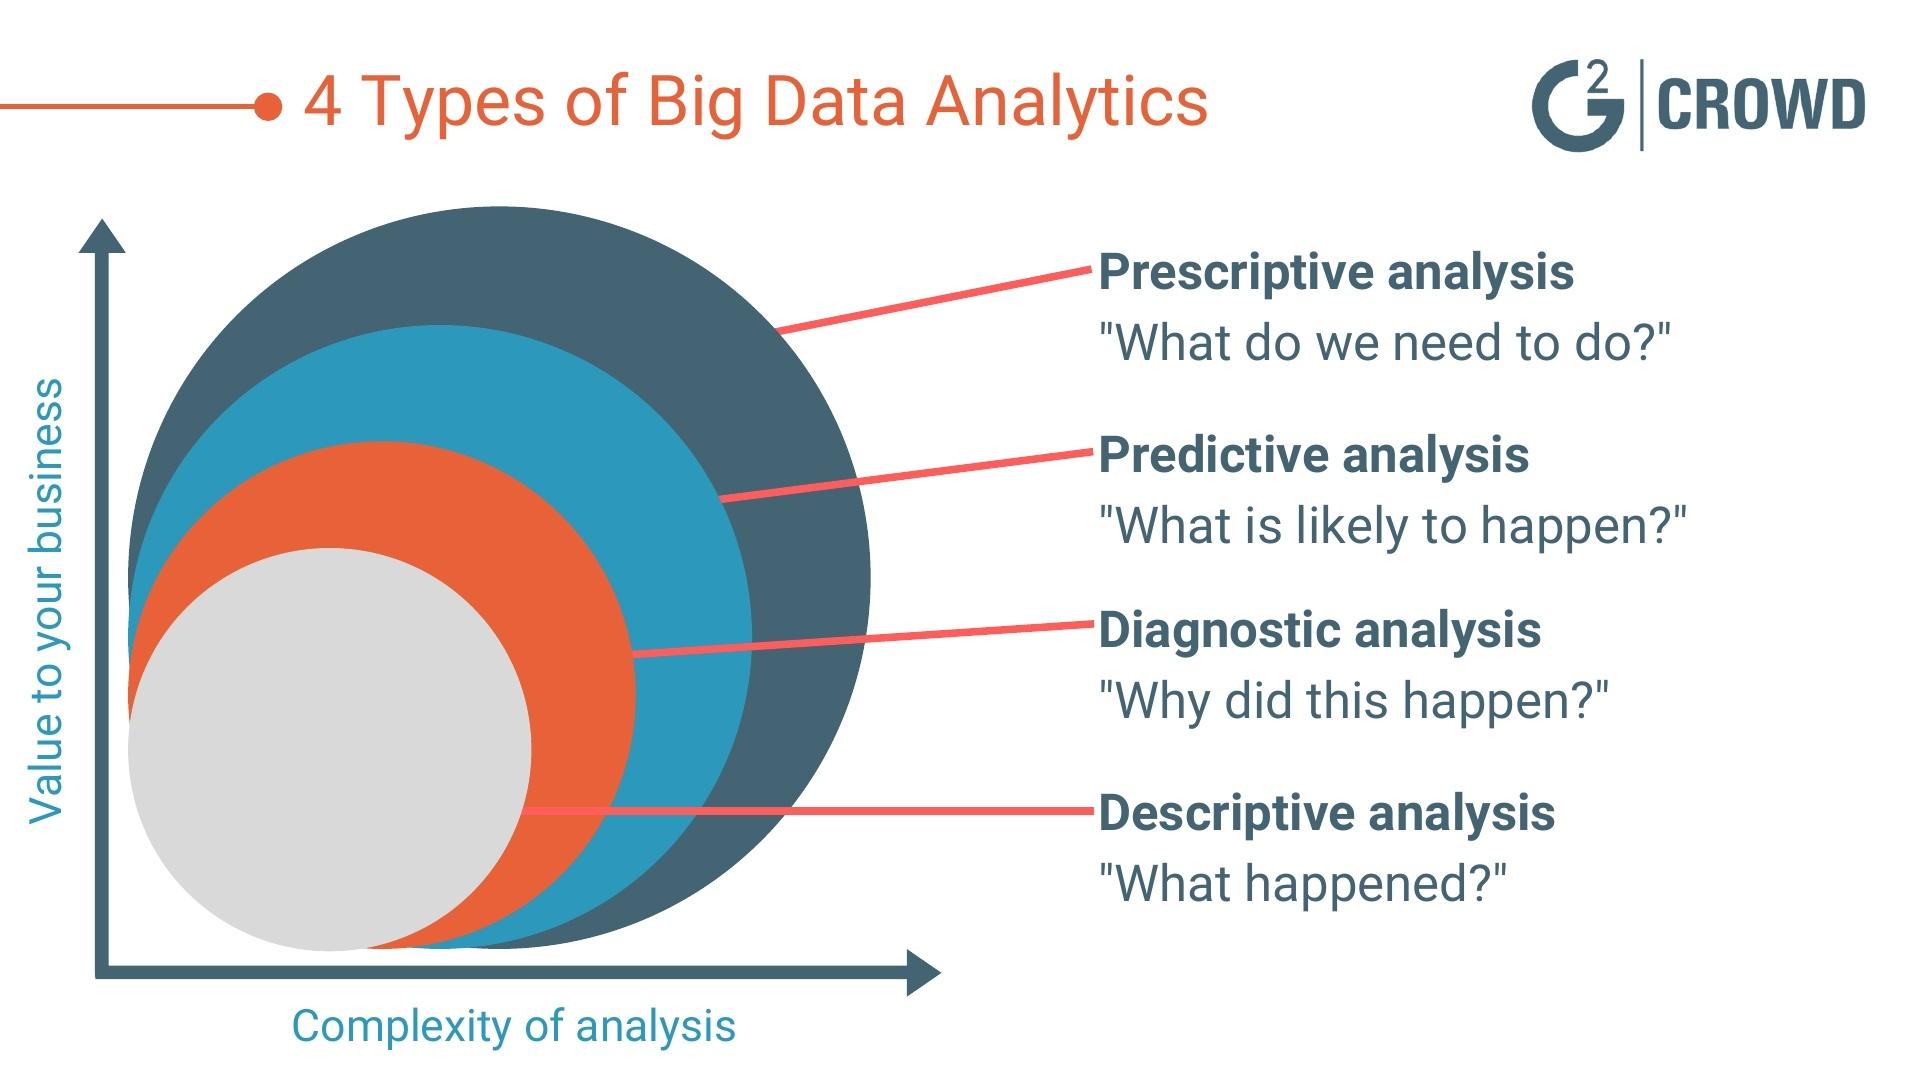 4-types-of-big-data-analytics